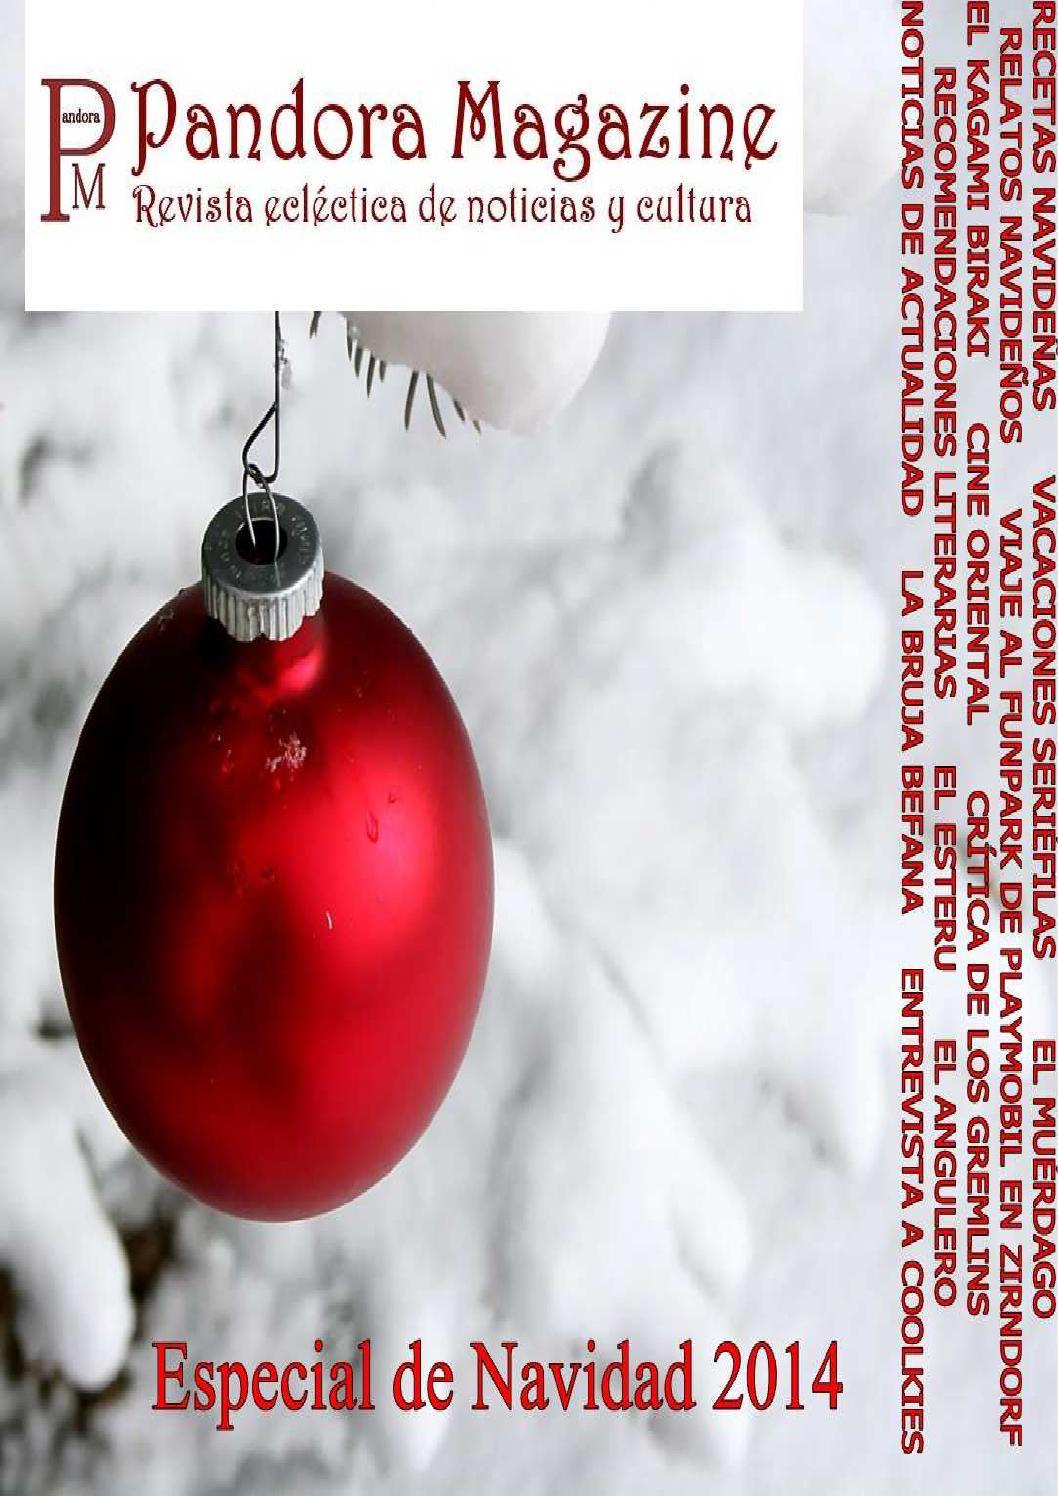 Especial Navidad 2014 by Pandora Magazine - issuu